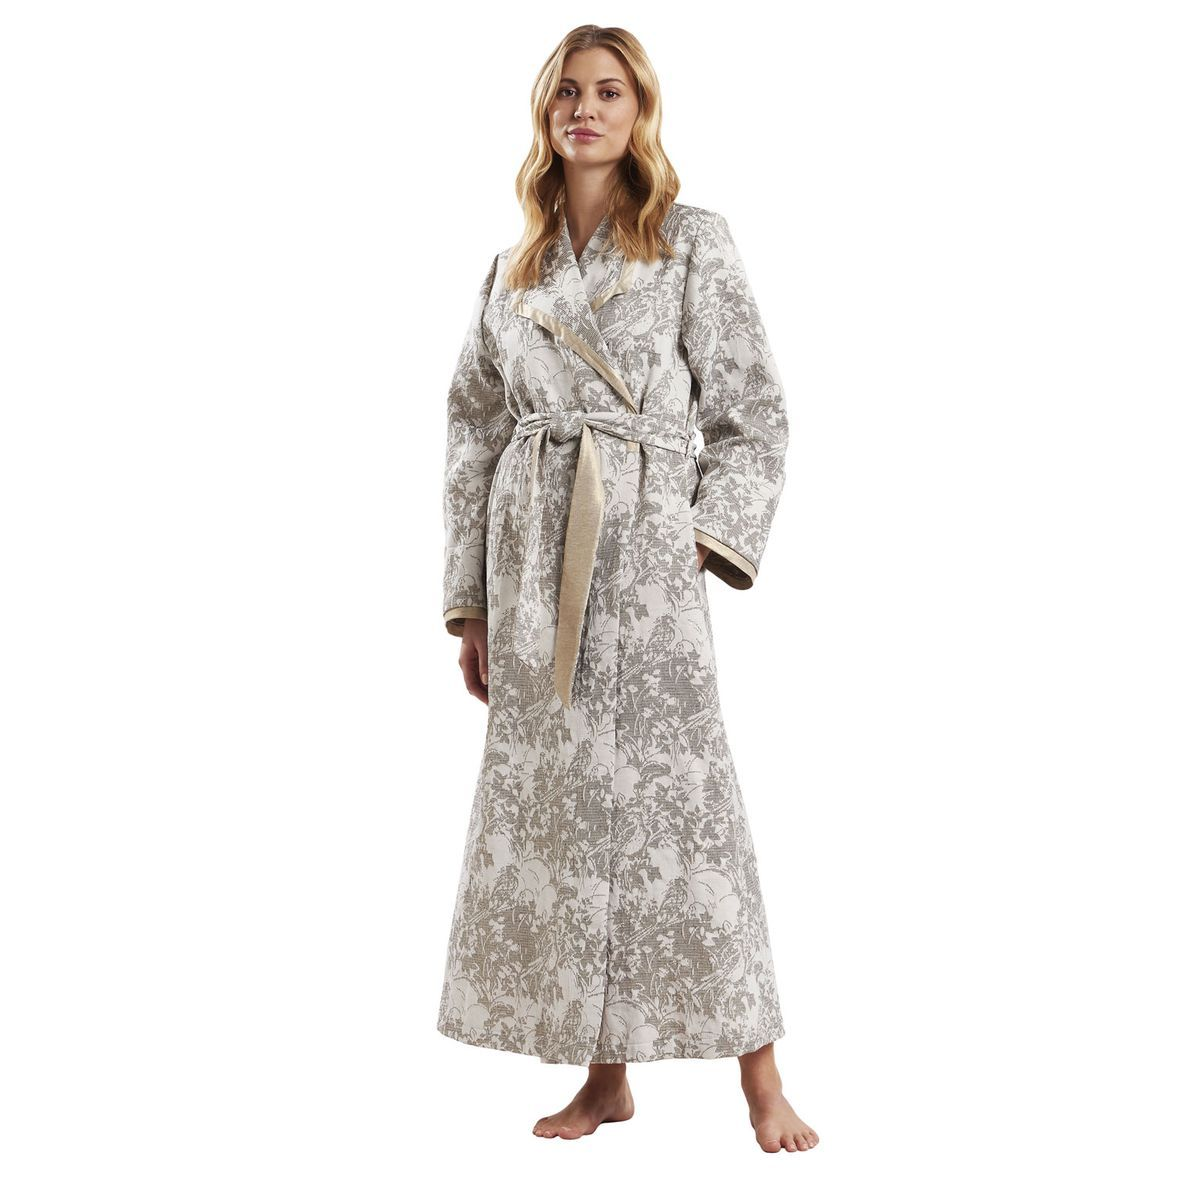 Robe De Chambre Floral Couture Taille 42 Robe De Chambre